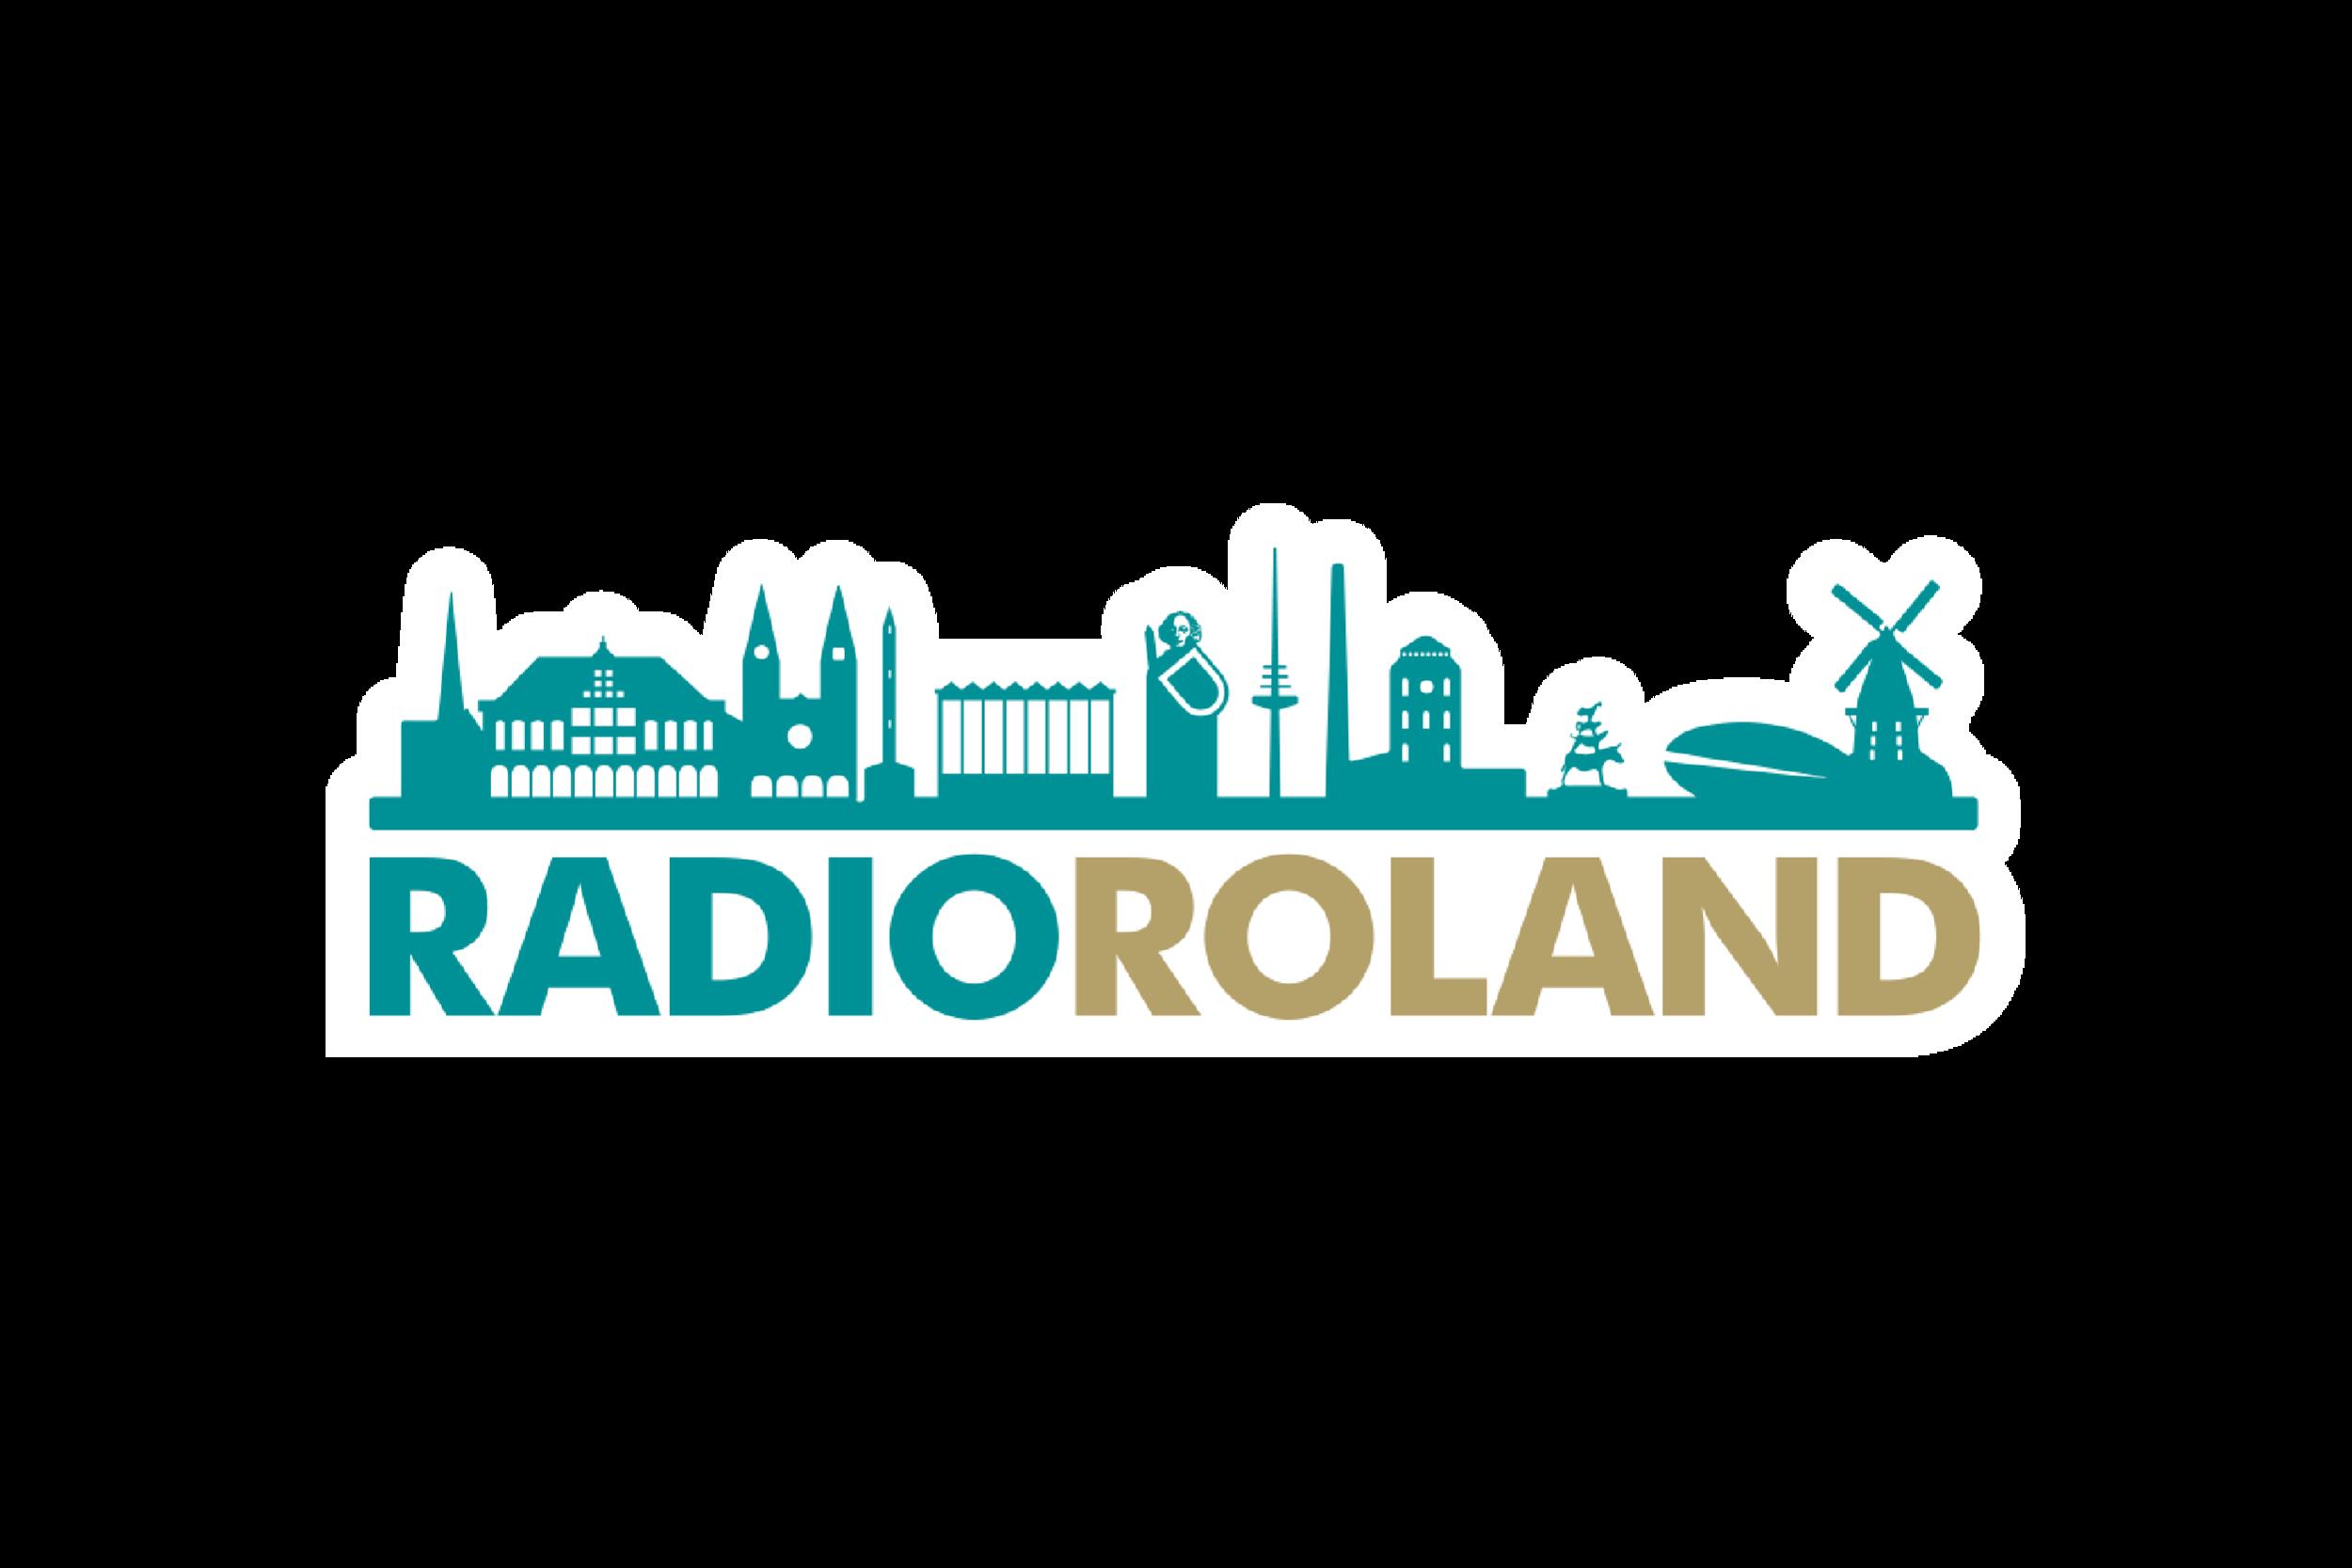 RadioRoland.png